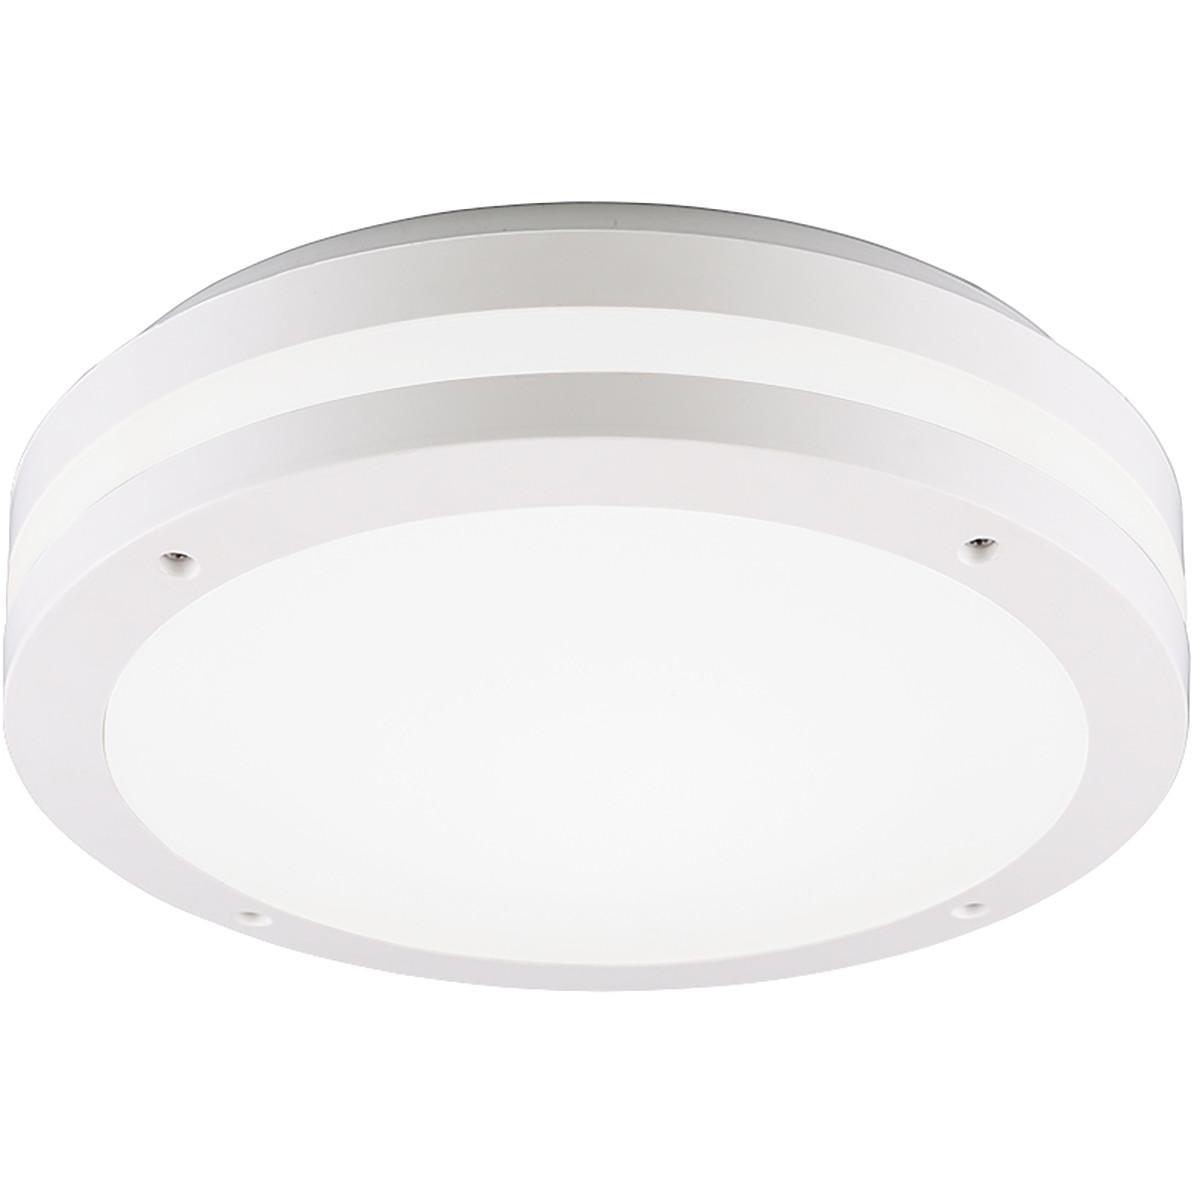 LED Plafondlamp - Trion Keraly - Opbouw Rond - Waterdicht - 12W - Warm Wit 3000K - Mat Wit - Kunstst